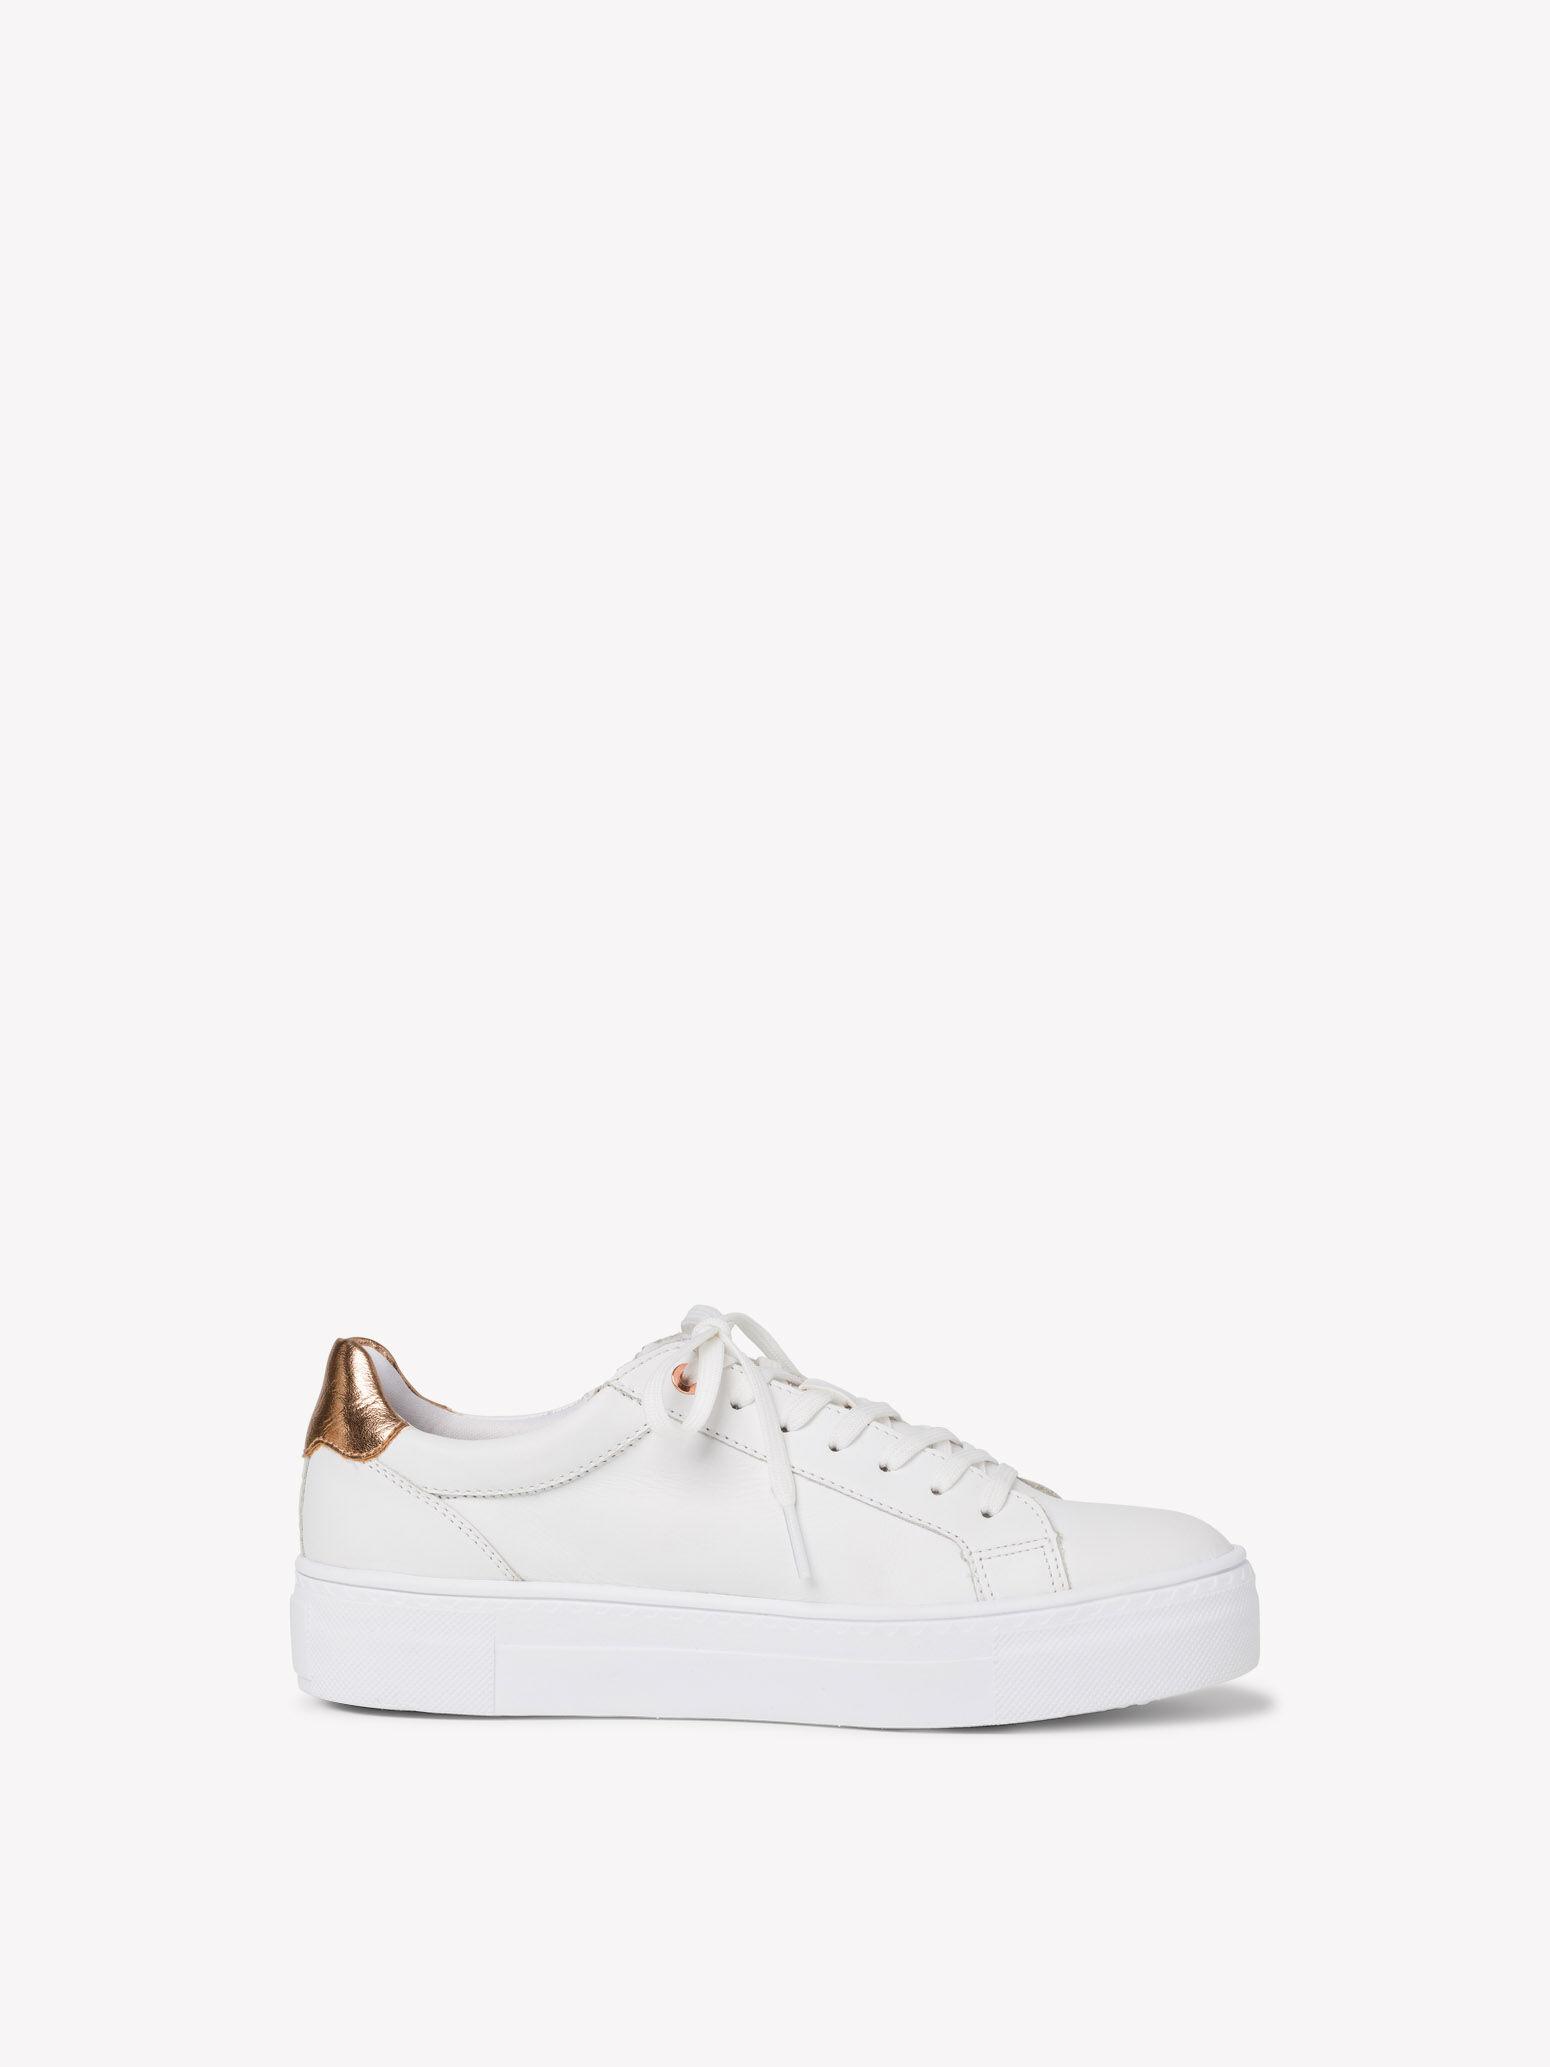 tamaris sneaker weiß rosegold